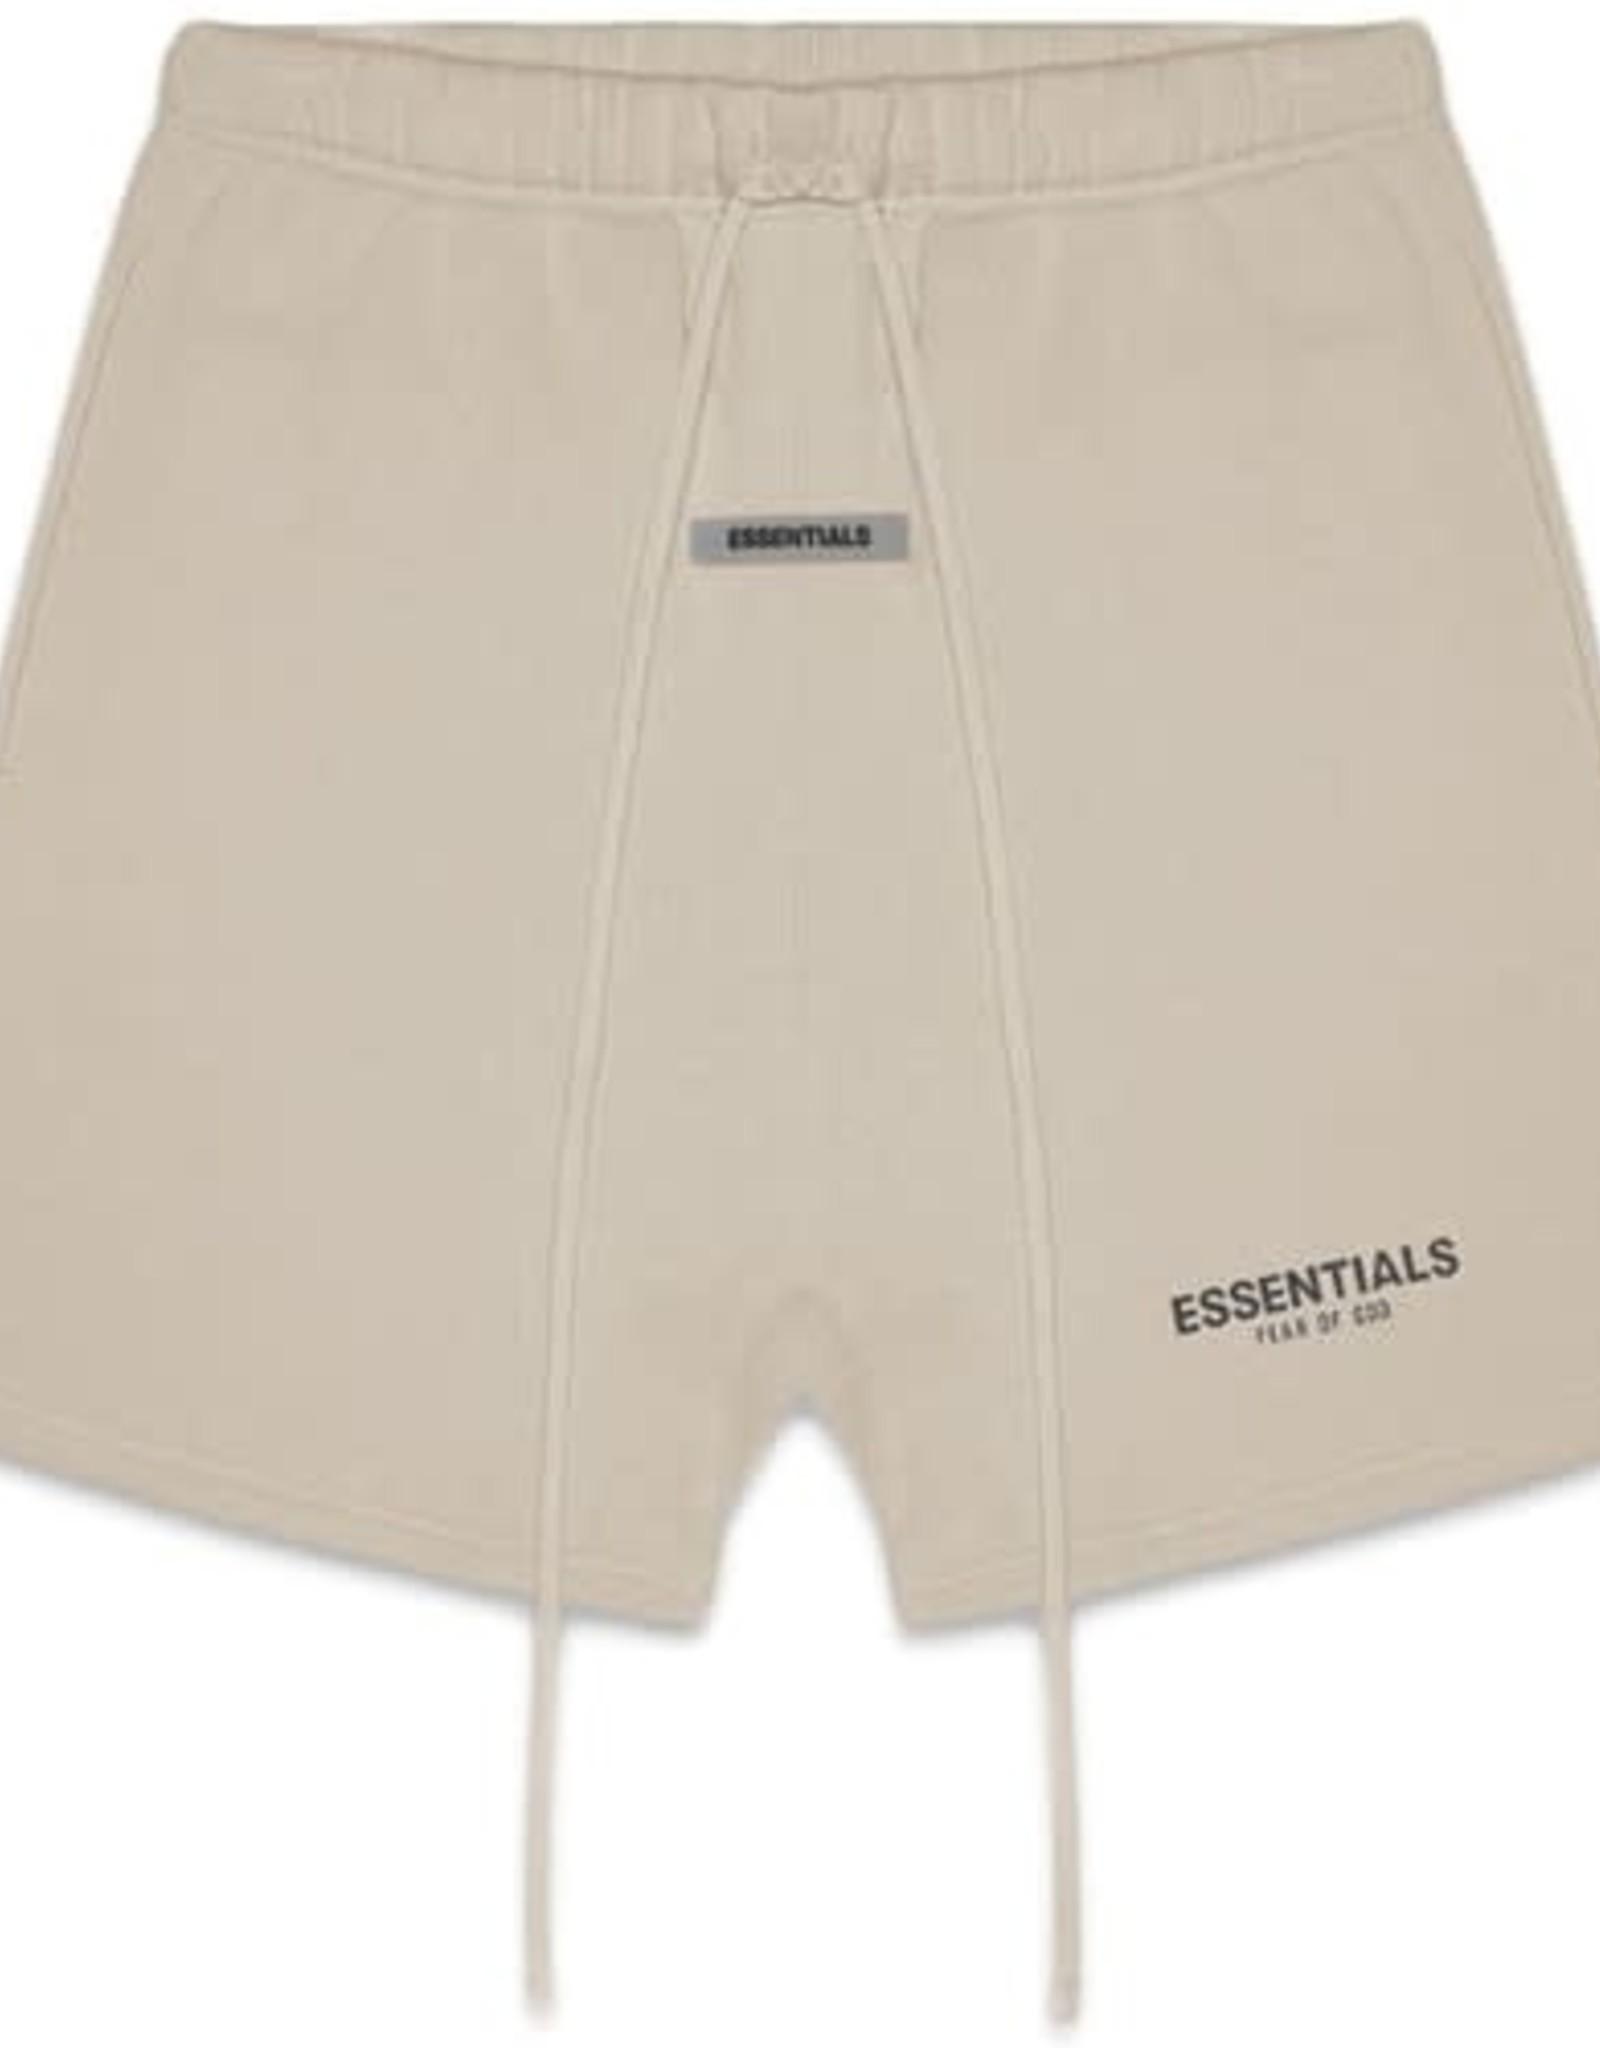 FEAR OF GOD ESSENTIALS Fleece Shorts